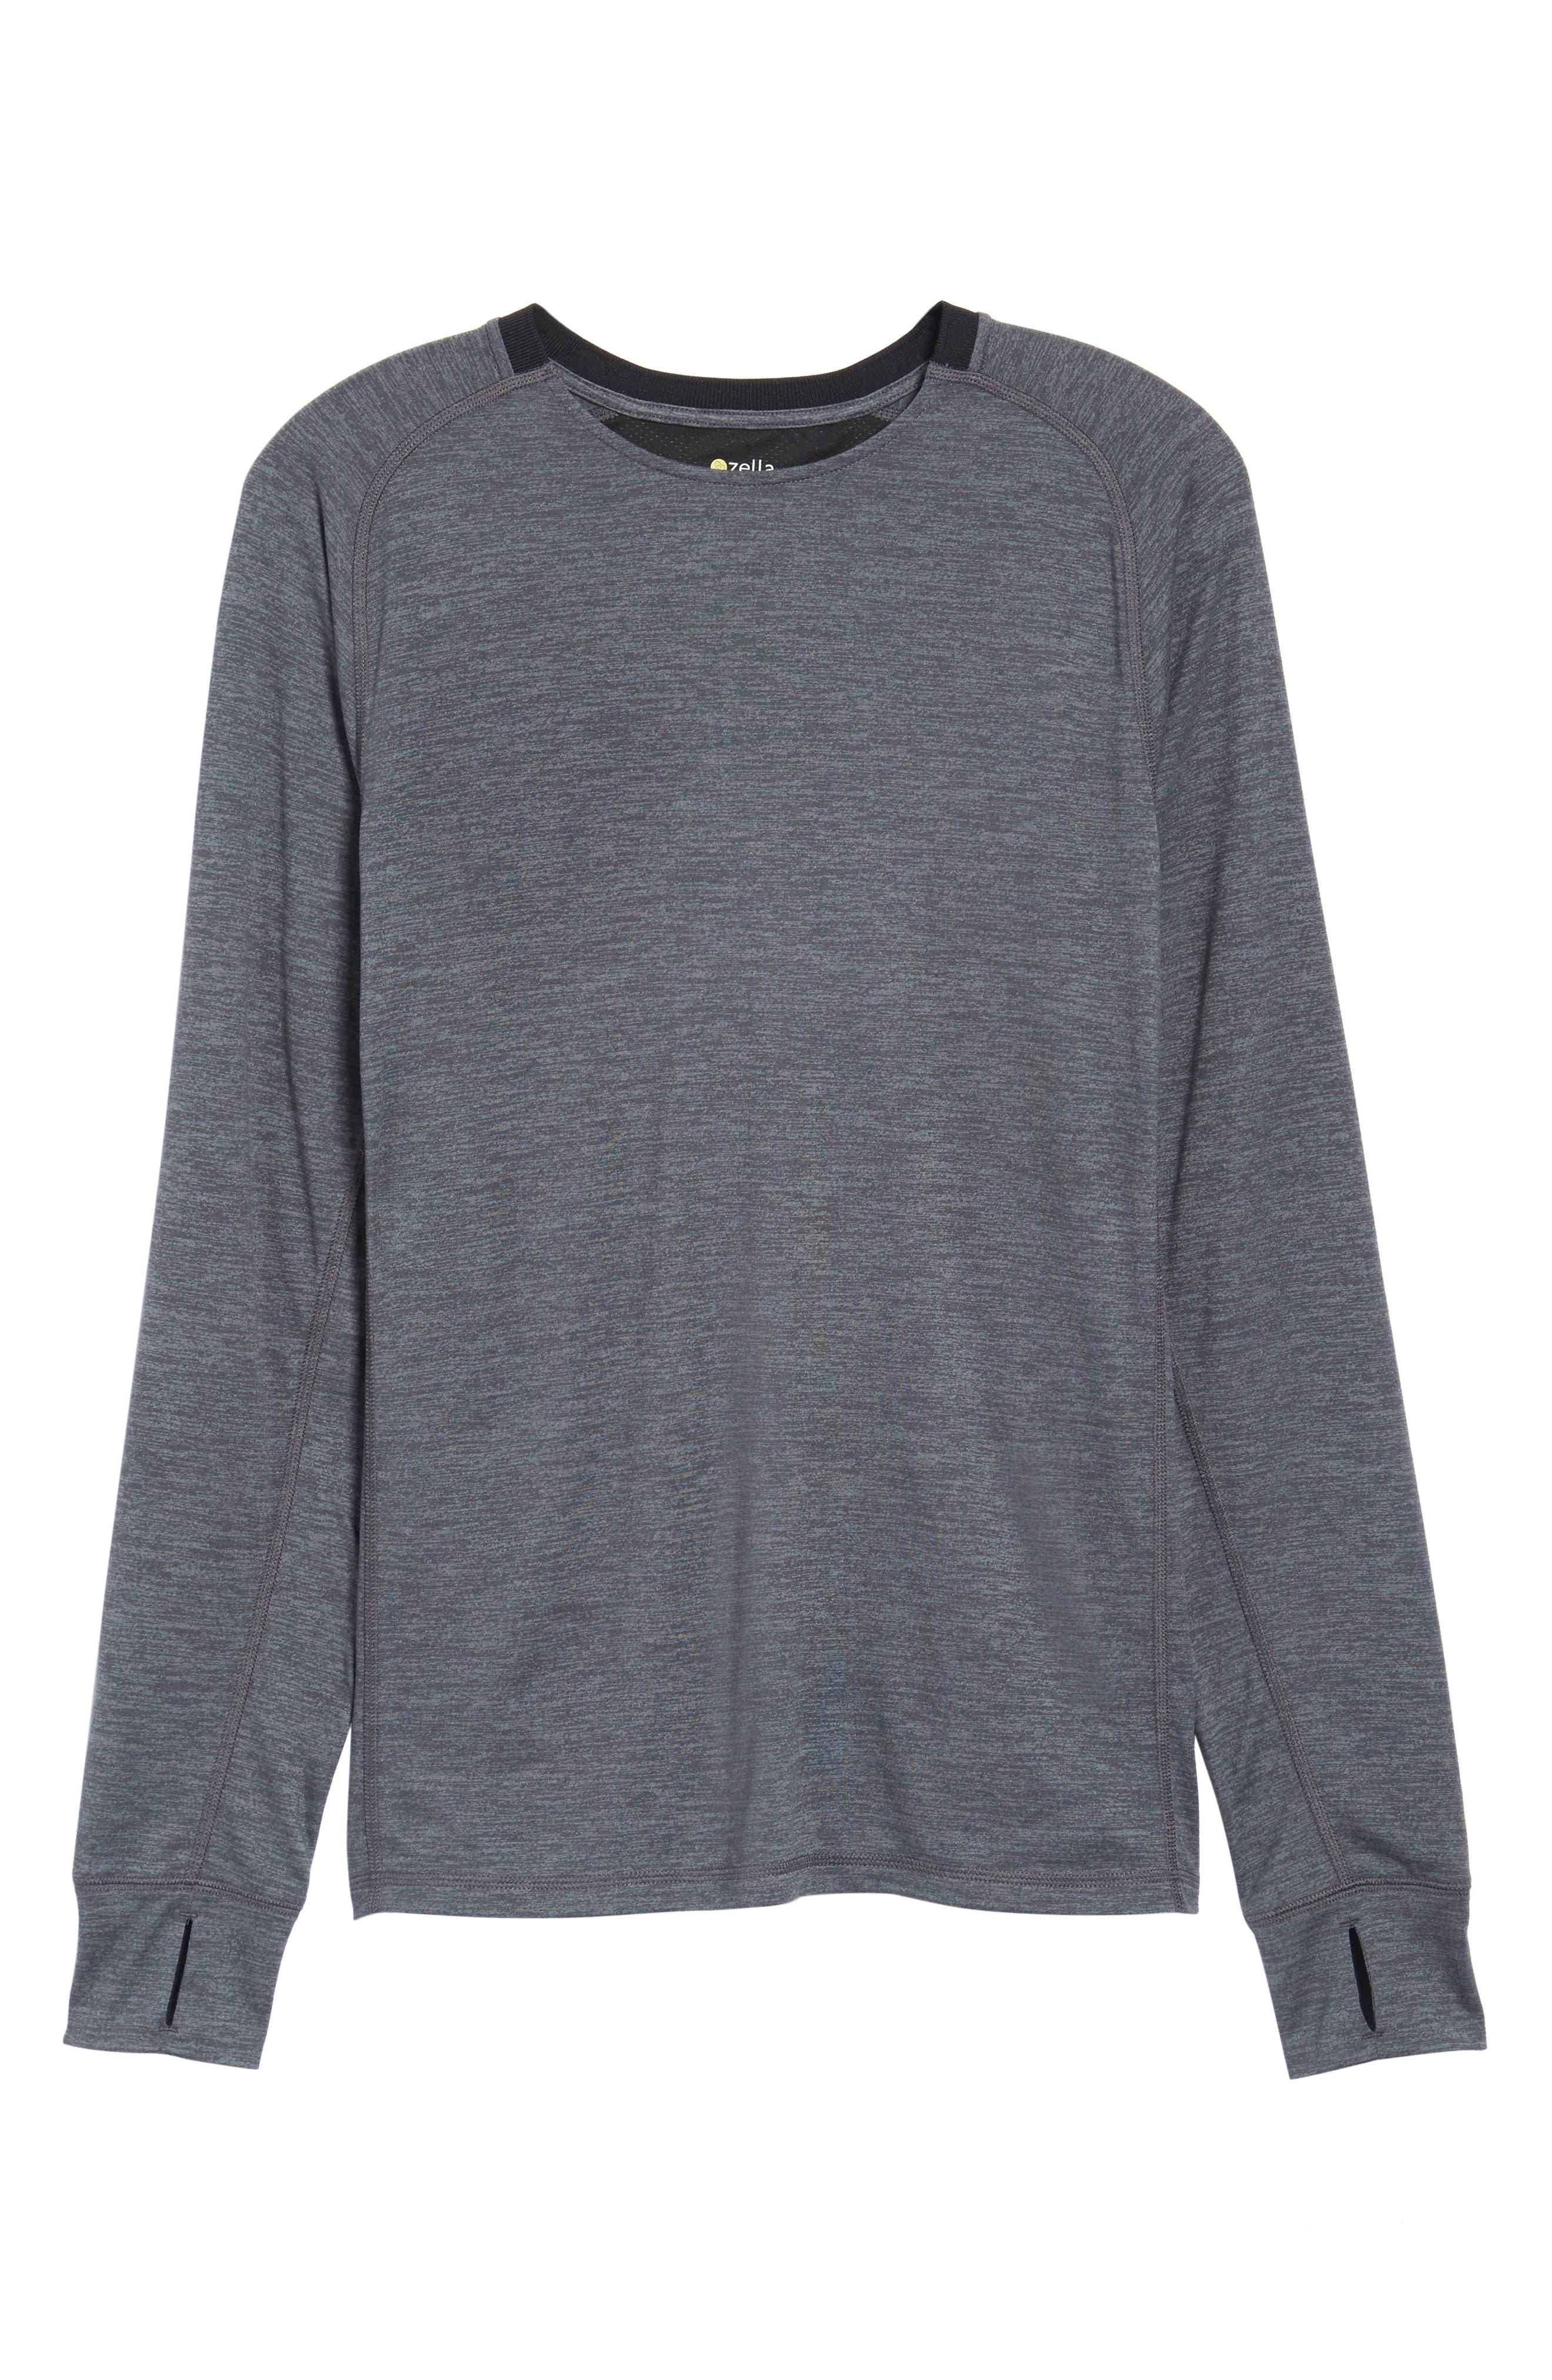 Larosite Athletic Fit T-Shirt,                             Alternate thumbnail 6, color,                             GREY EBONY MELANGE